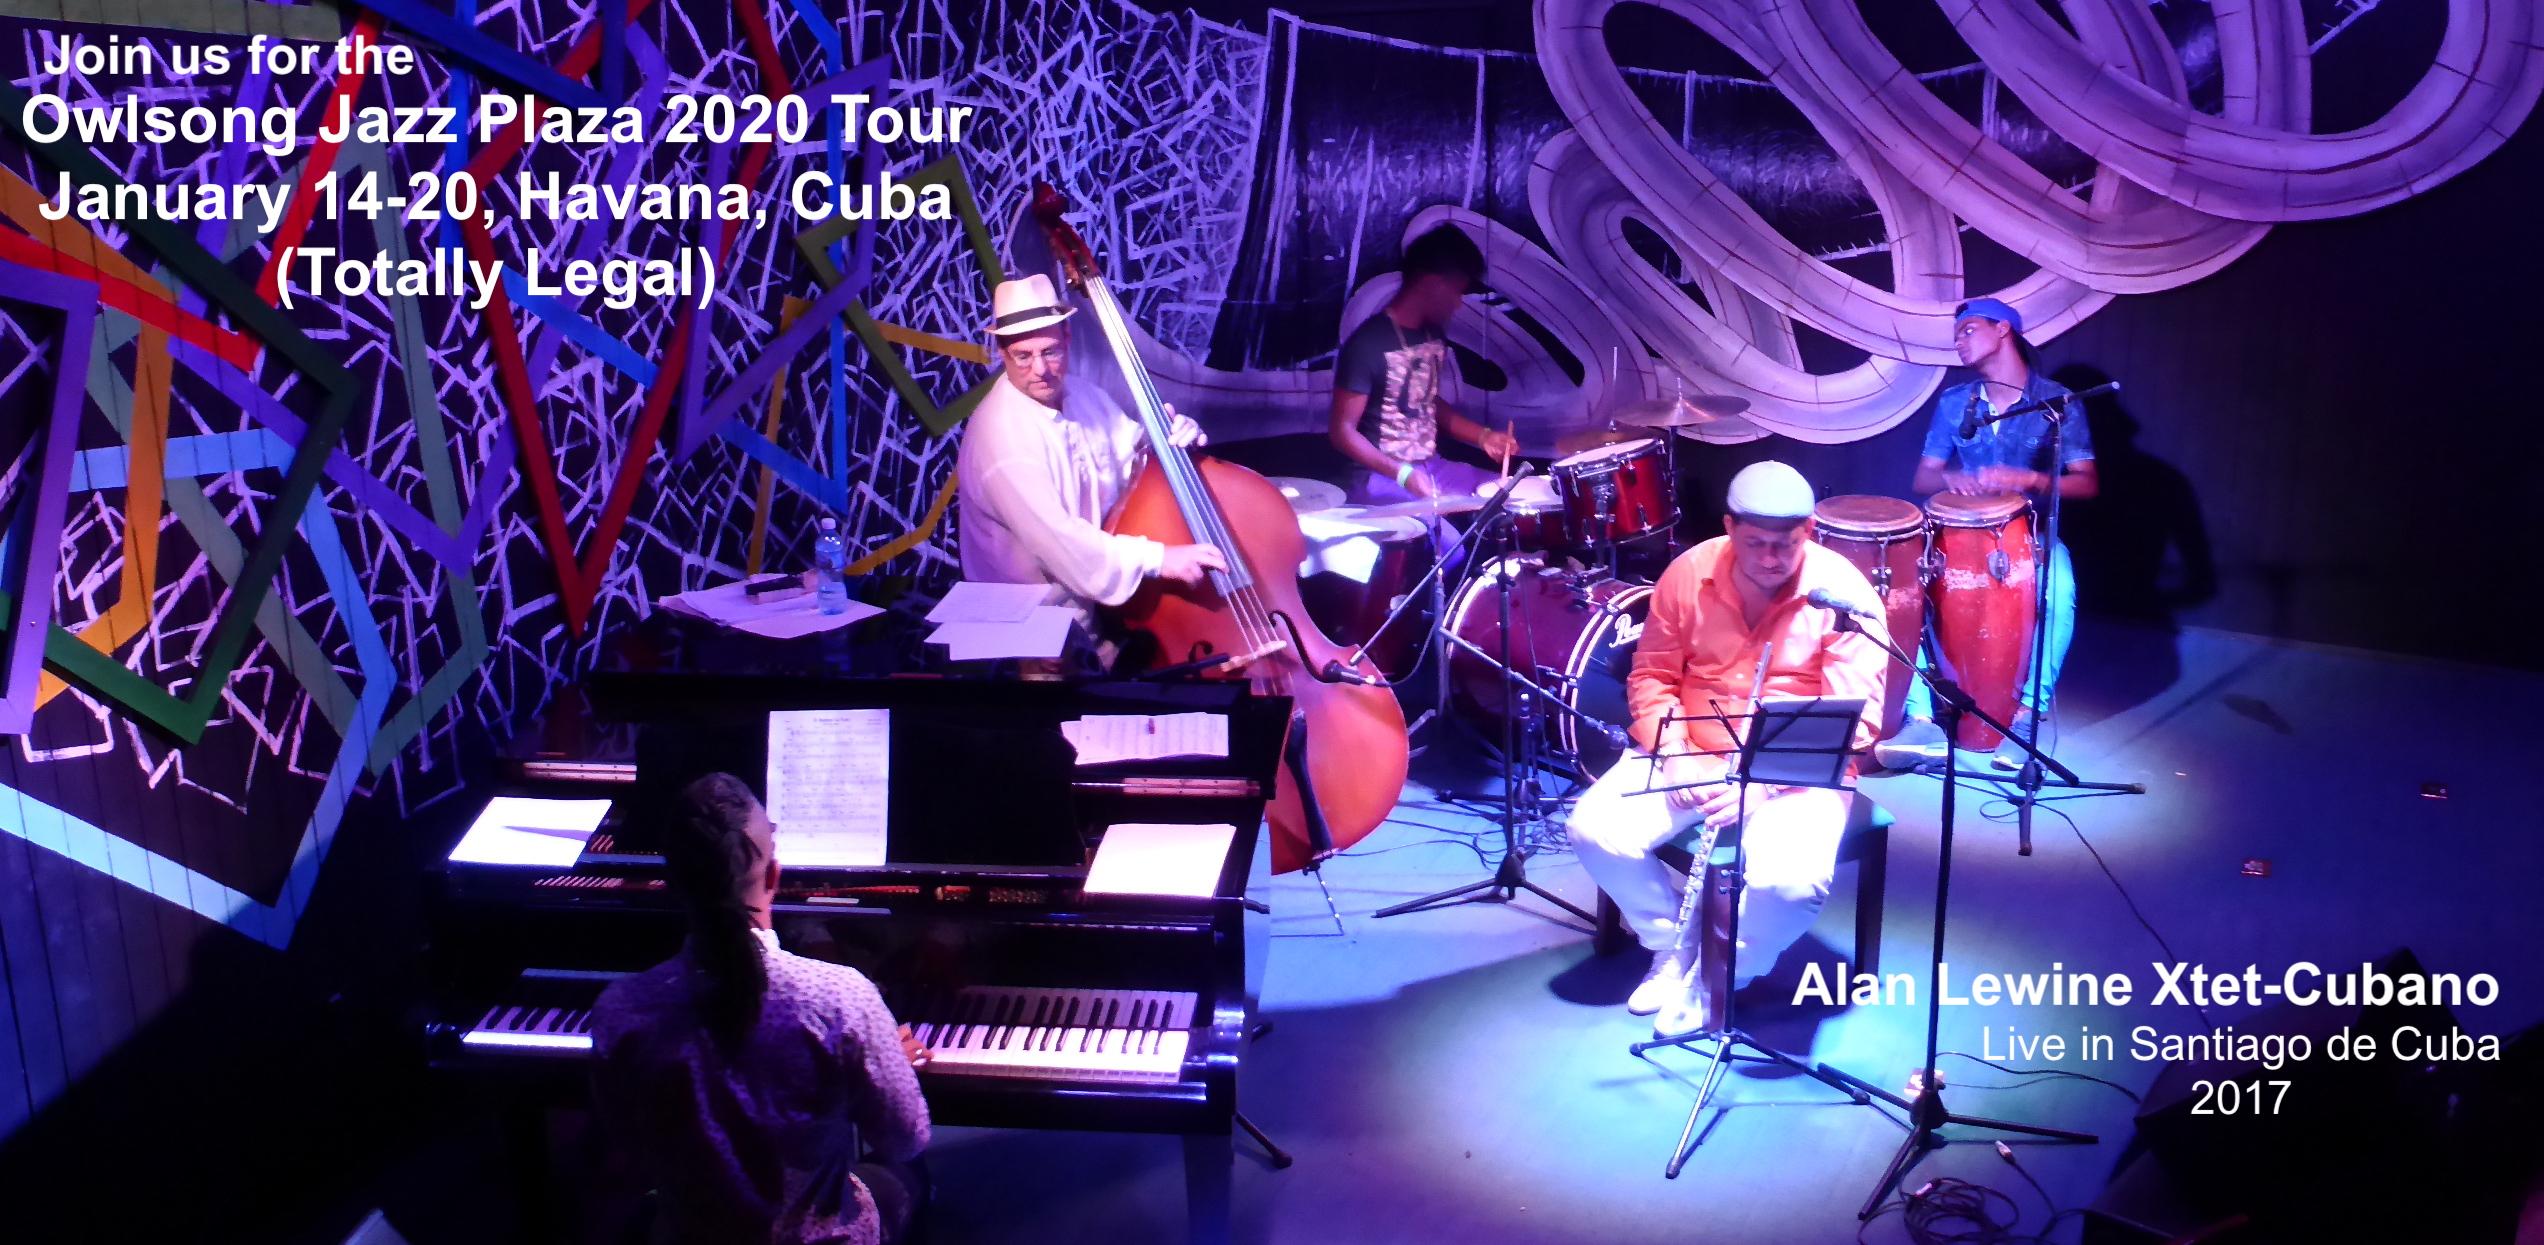 Alan Lewine Xtet - Coming to Havana Jazz Plaza